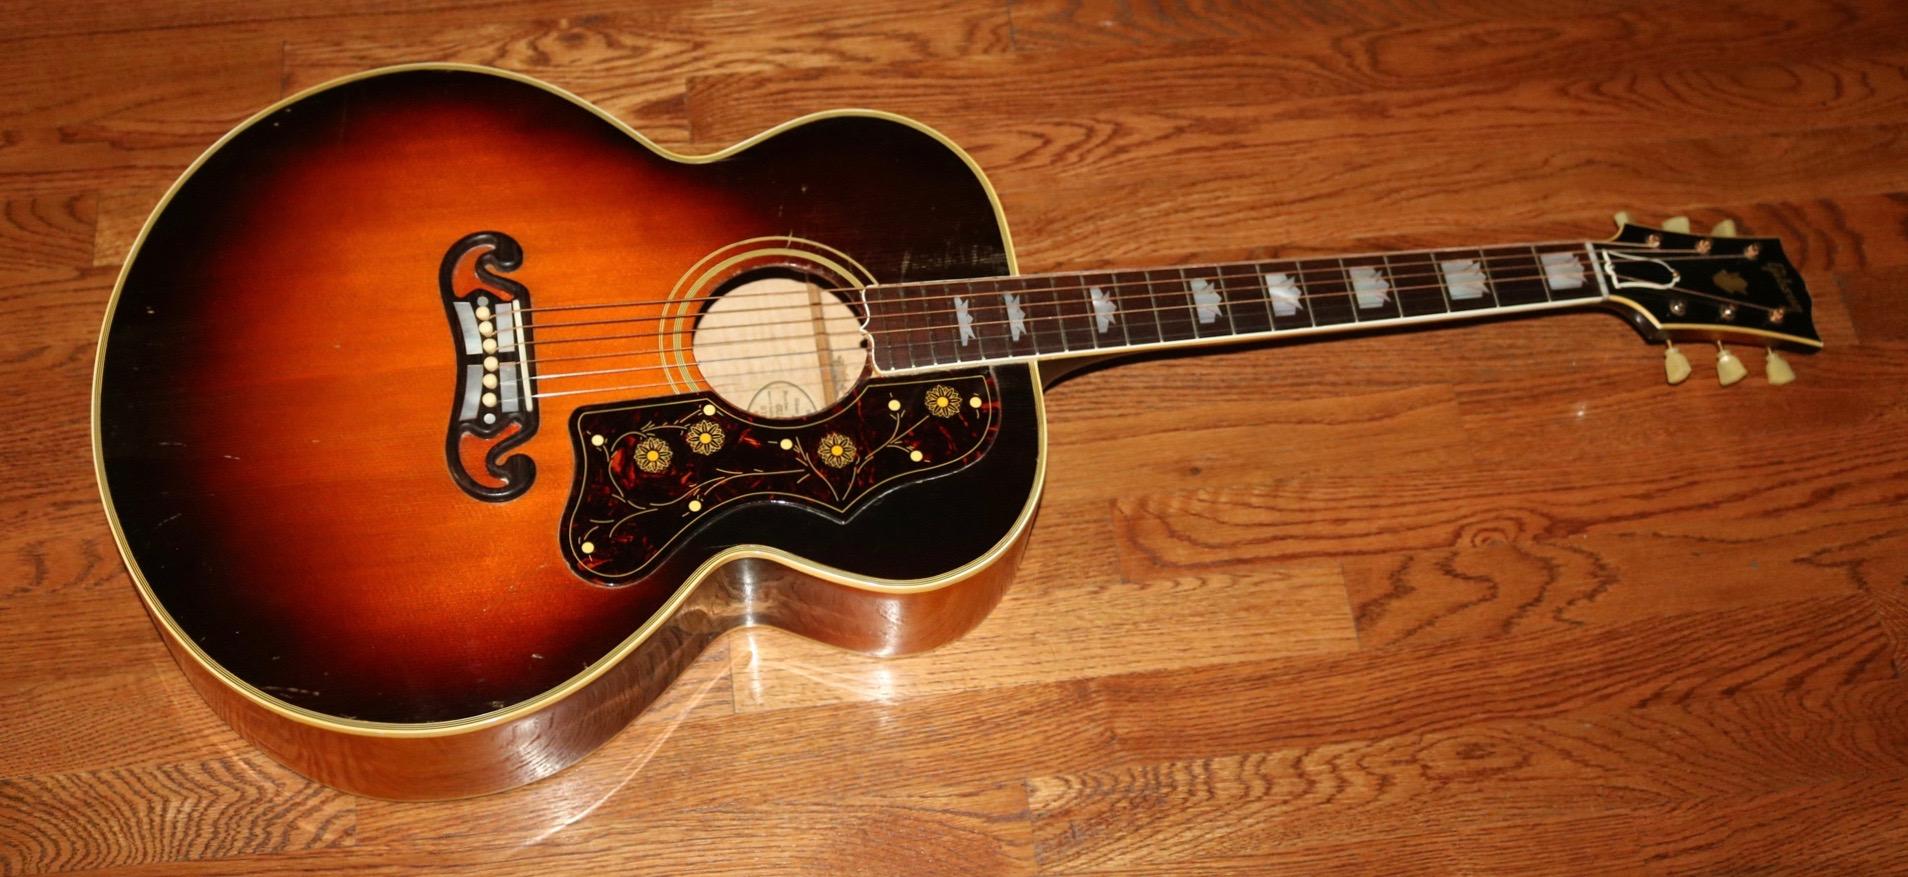 vintage guitars, Mecum Auctions adds vintage guitars to its docket, ClassicCars.com Journal